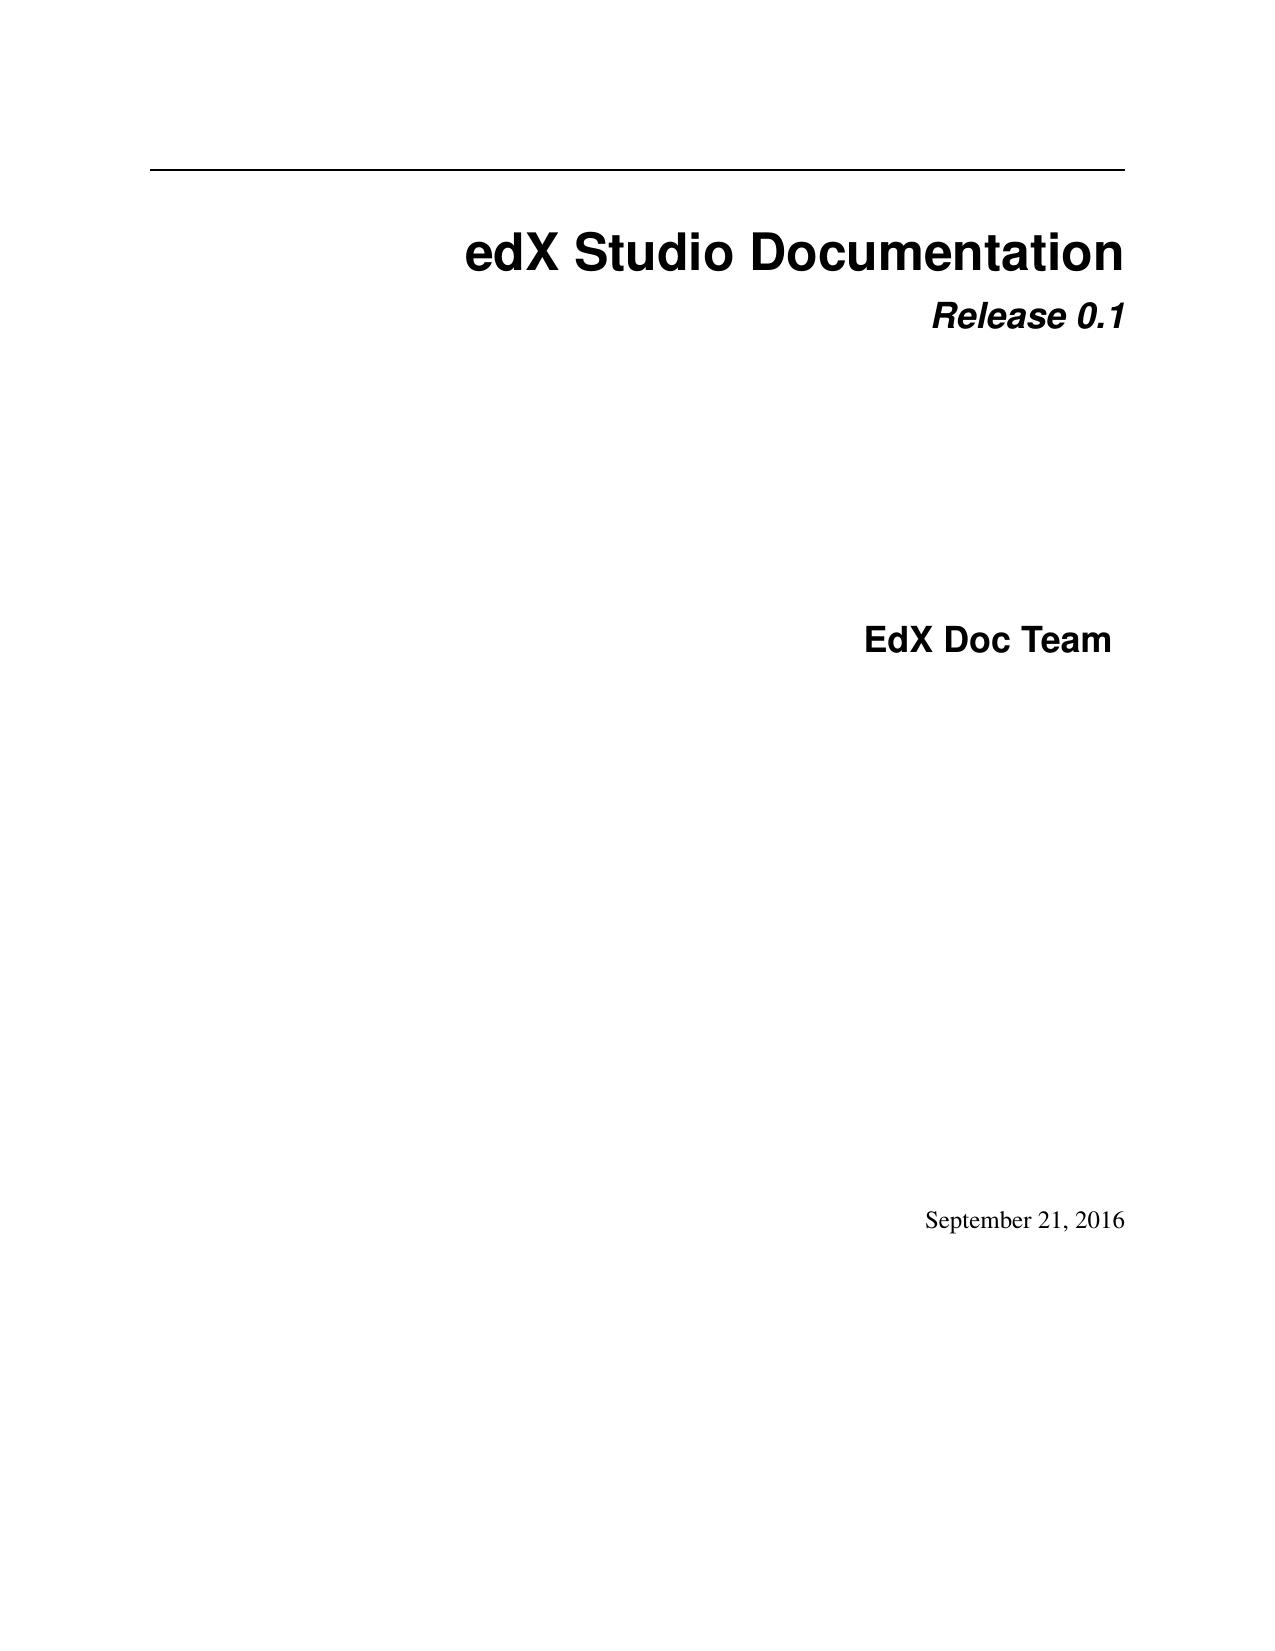 edX Studio Documentation | manualzz com